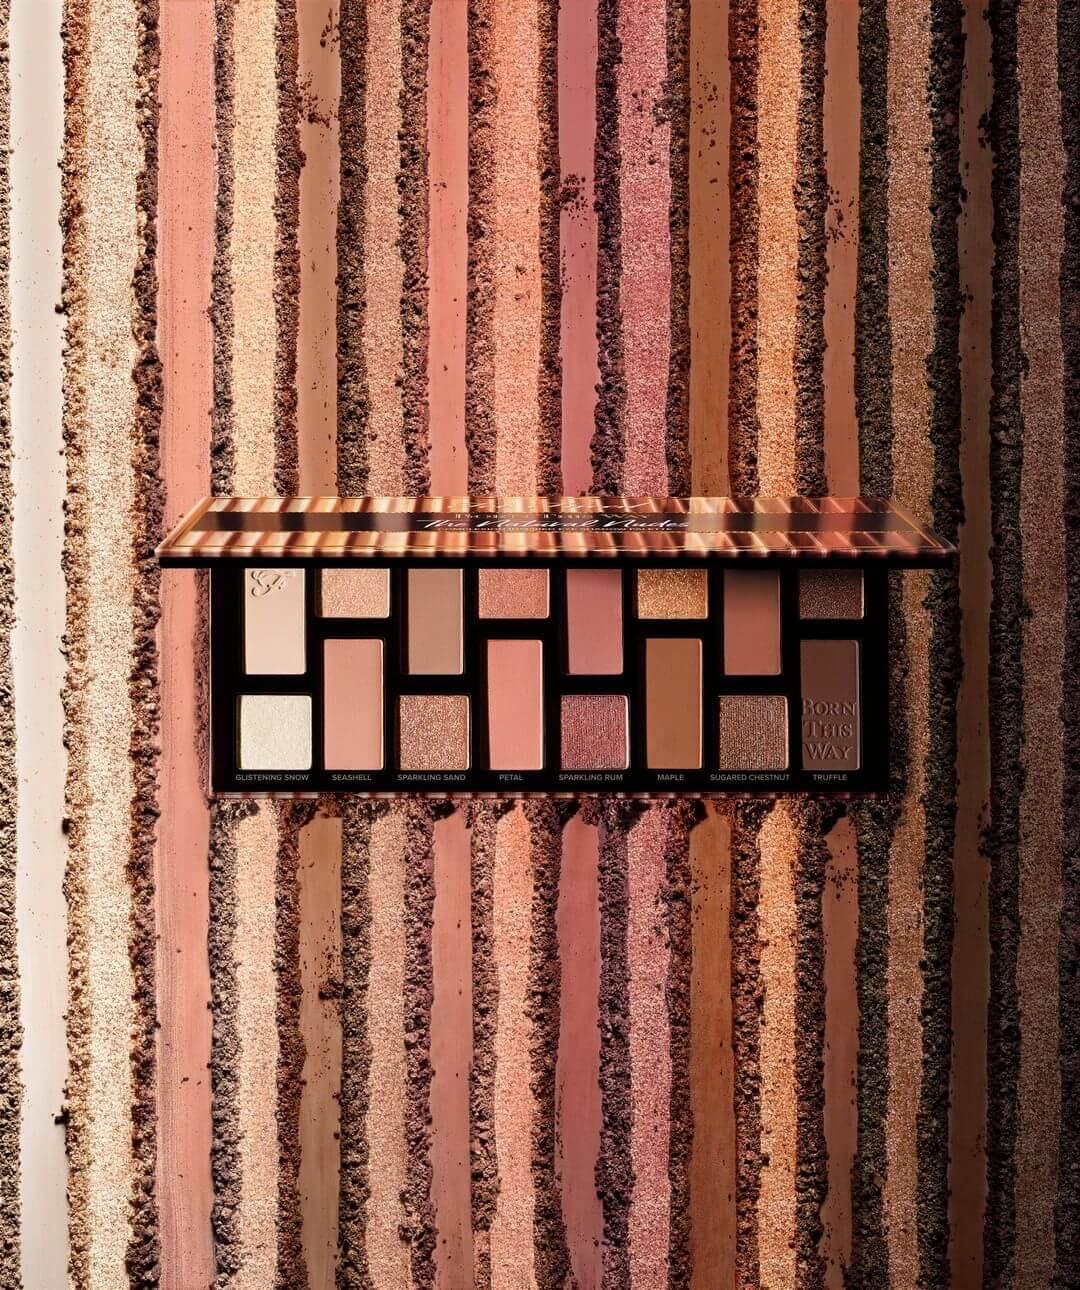 TOO FACED Born This Way Eye Shadow Palette HK$350 這個palette名副其實以原生皮膚顏色為靈感,用十六種自然的顏色營造出「Born This Way」的感覺。眼影質地結合啞光、潤澤及閃爍,一盒就可以打造不同層次與風格,質地柔滑易推也是這個palette的賣點之一。